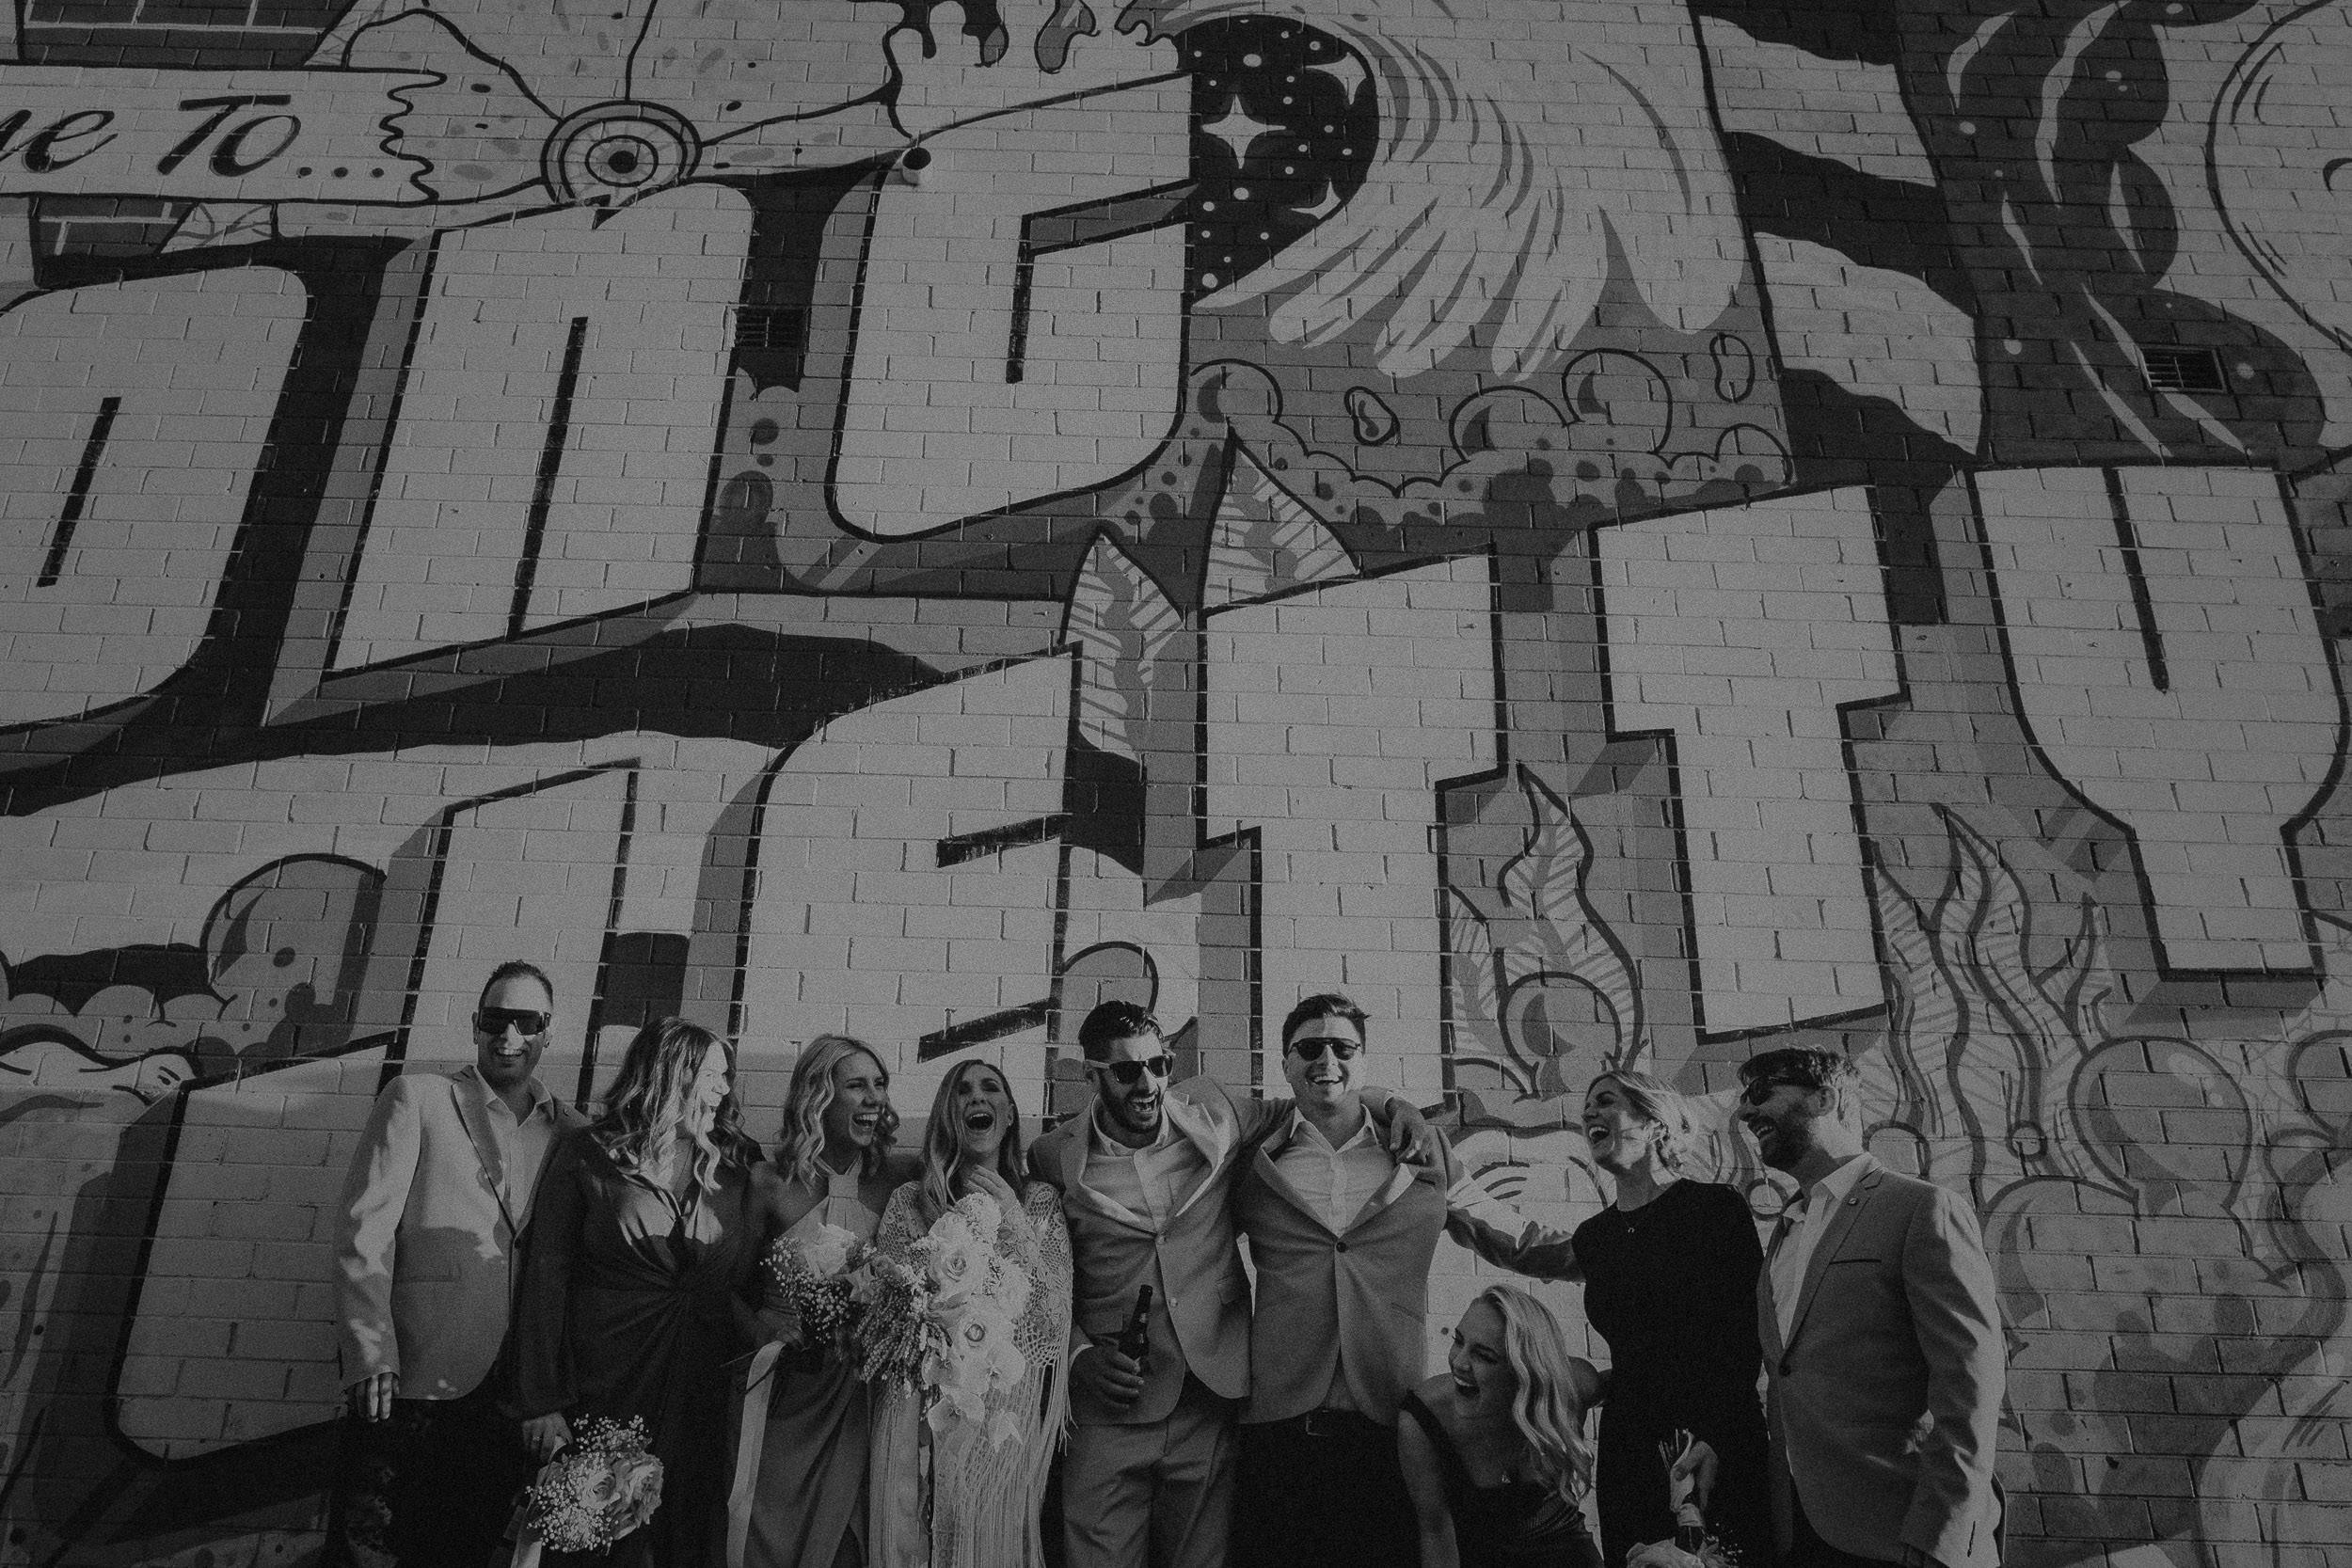 S&A Elopement - Kings & Thieves - Shred 'Til Dead - Central Coast Beach Forest Wedding - 350.jpg